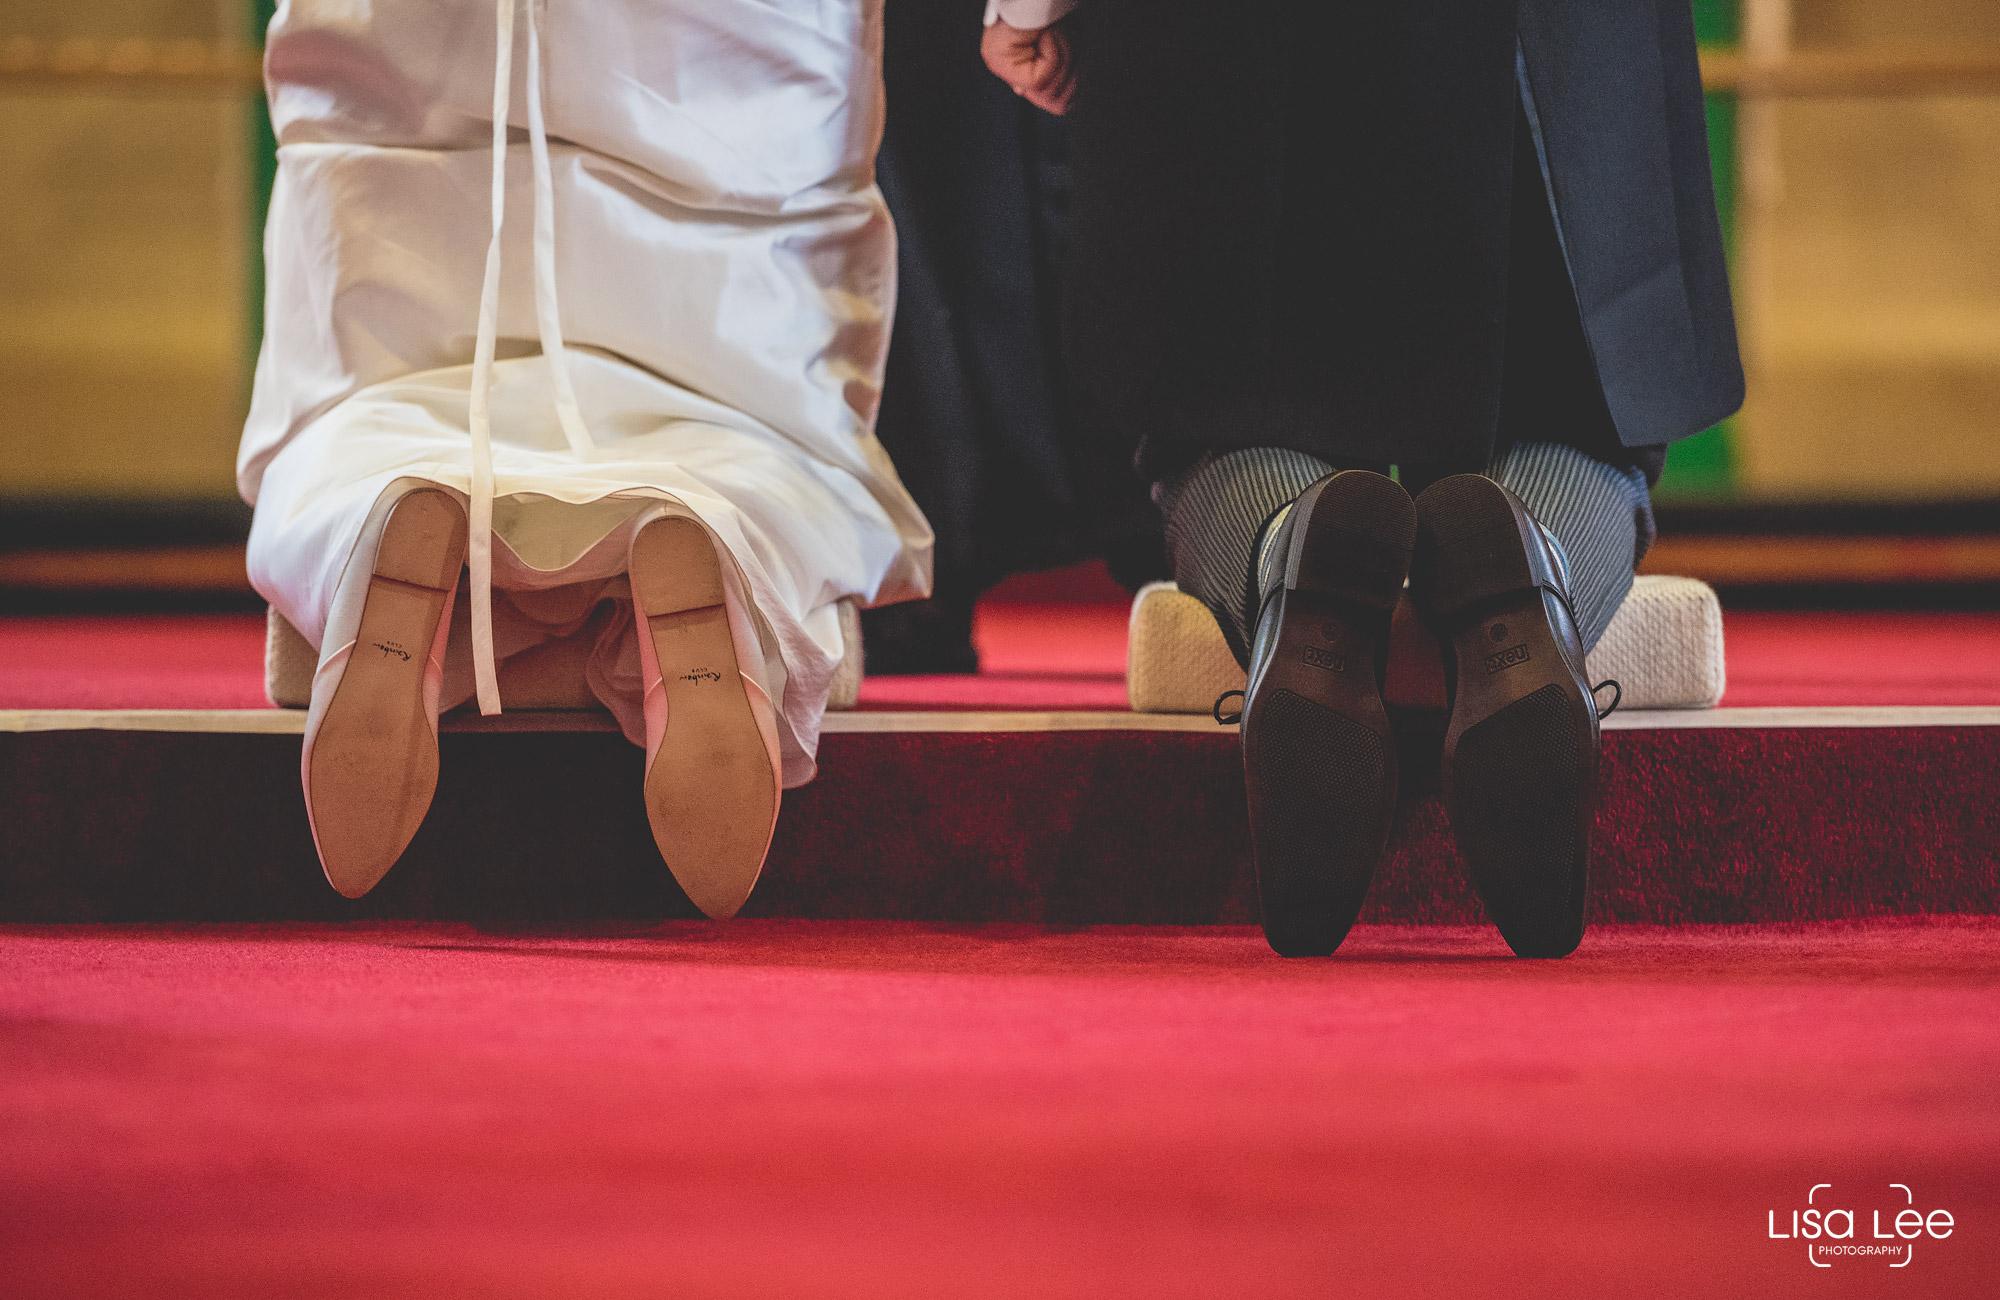 lisa-lee-wedding-photography-burton-4.jpg